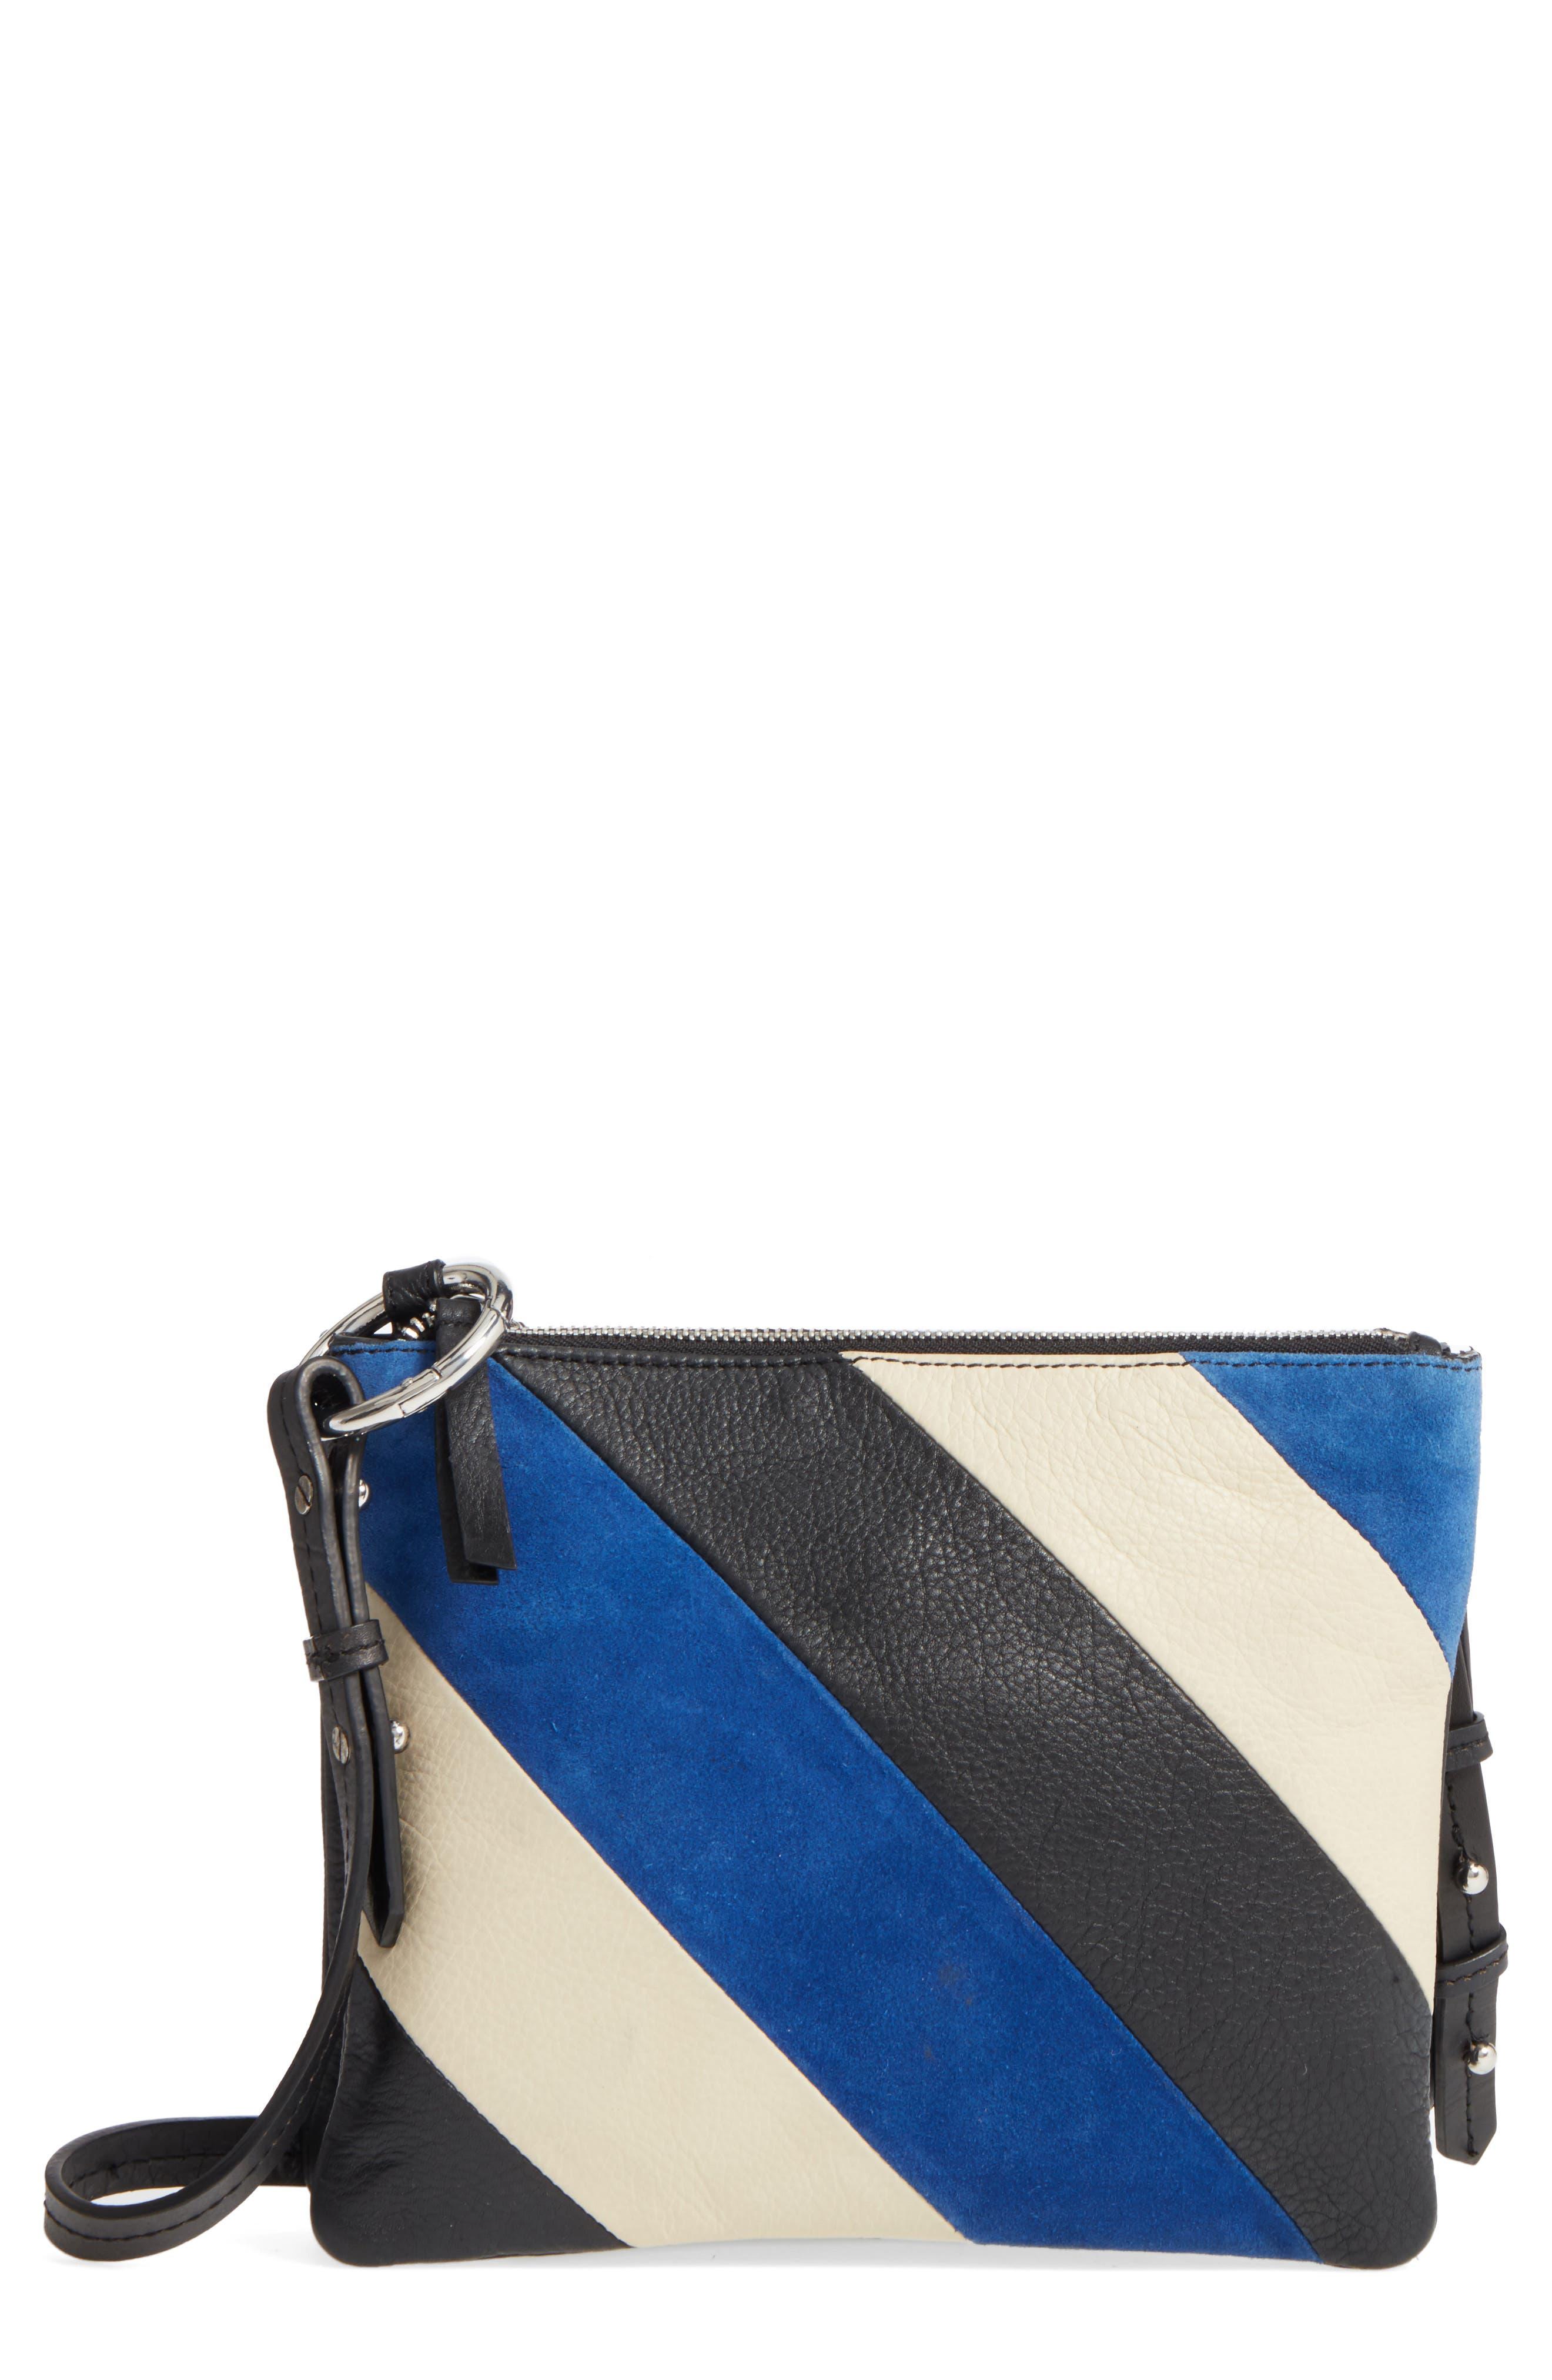 Premium Leather Bridget Crossbody Bag,                             Main thumbnail 1, color,                             001